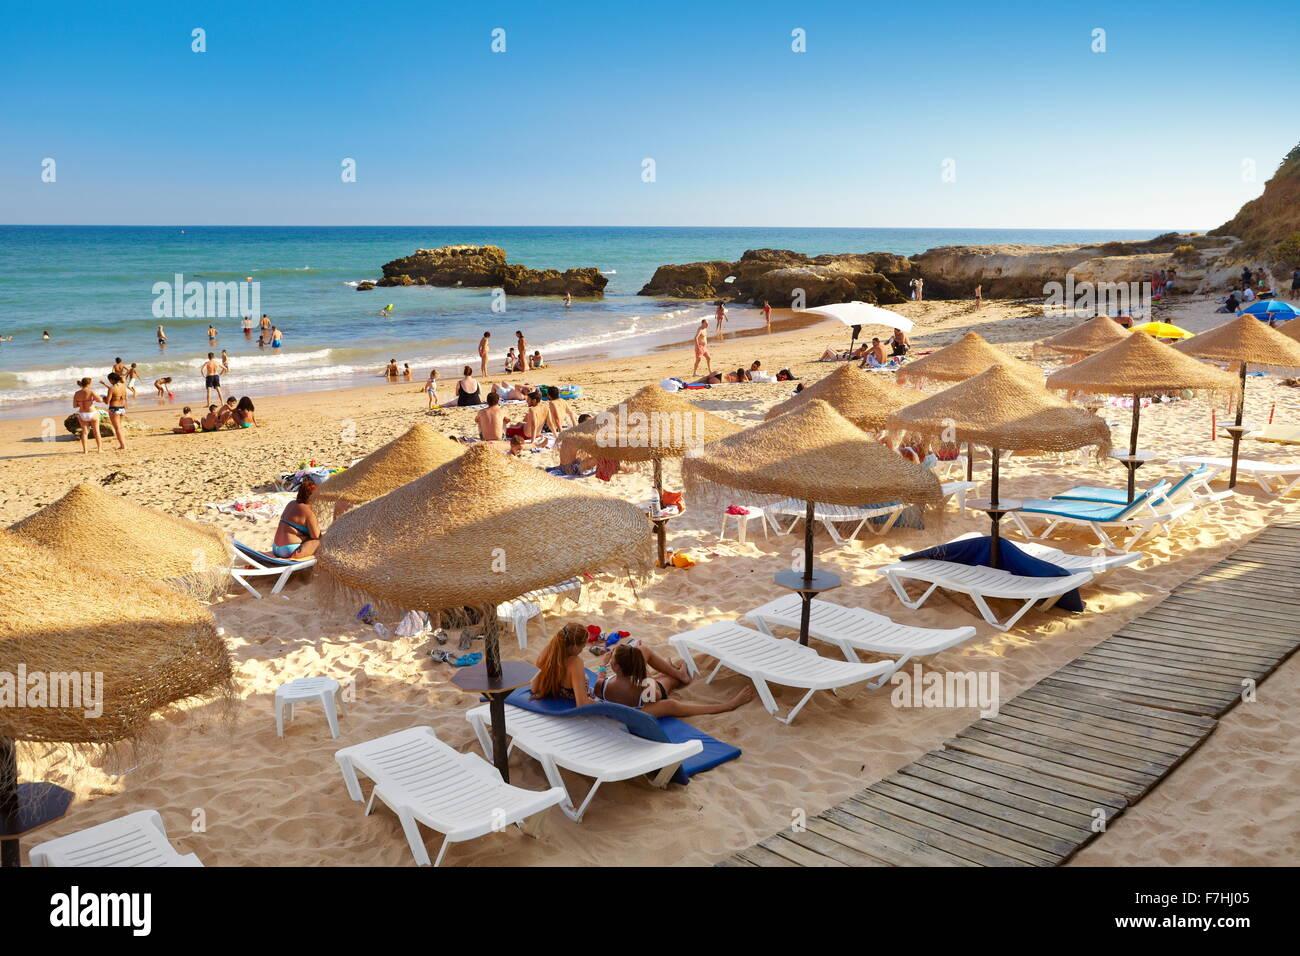 Albufeira Beach, Algarve coast, Portugal Stock Photo